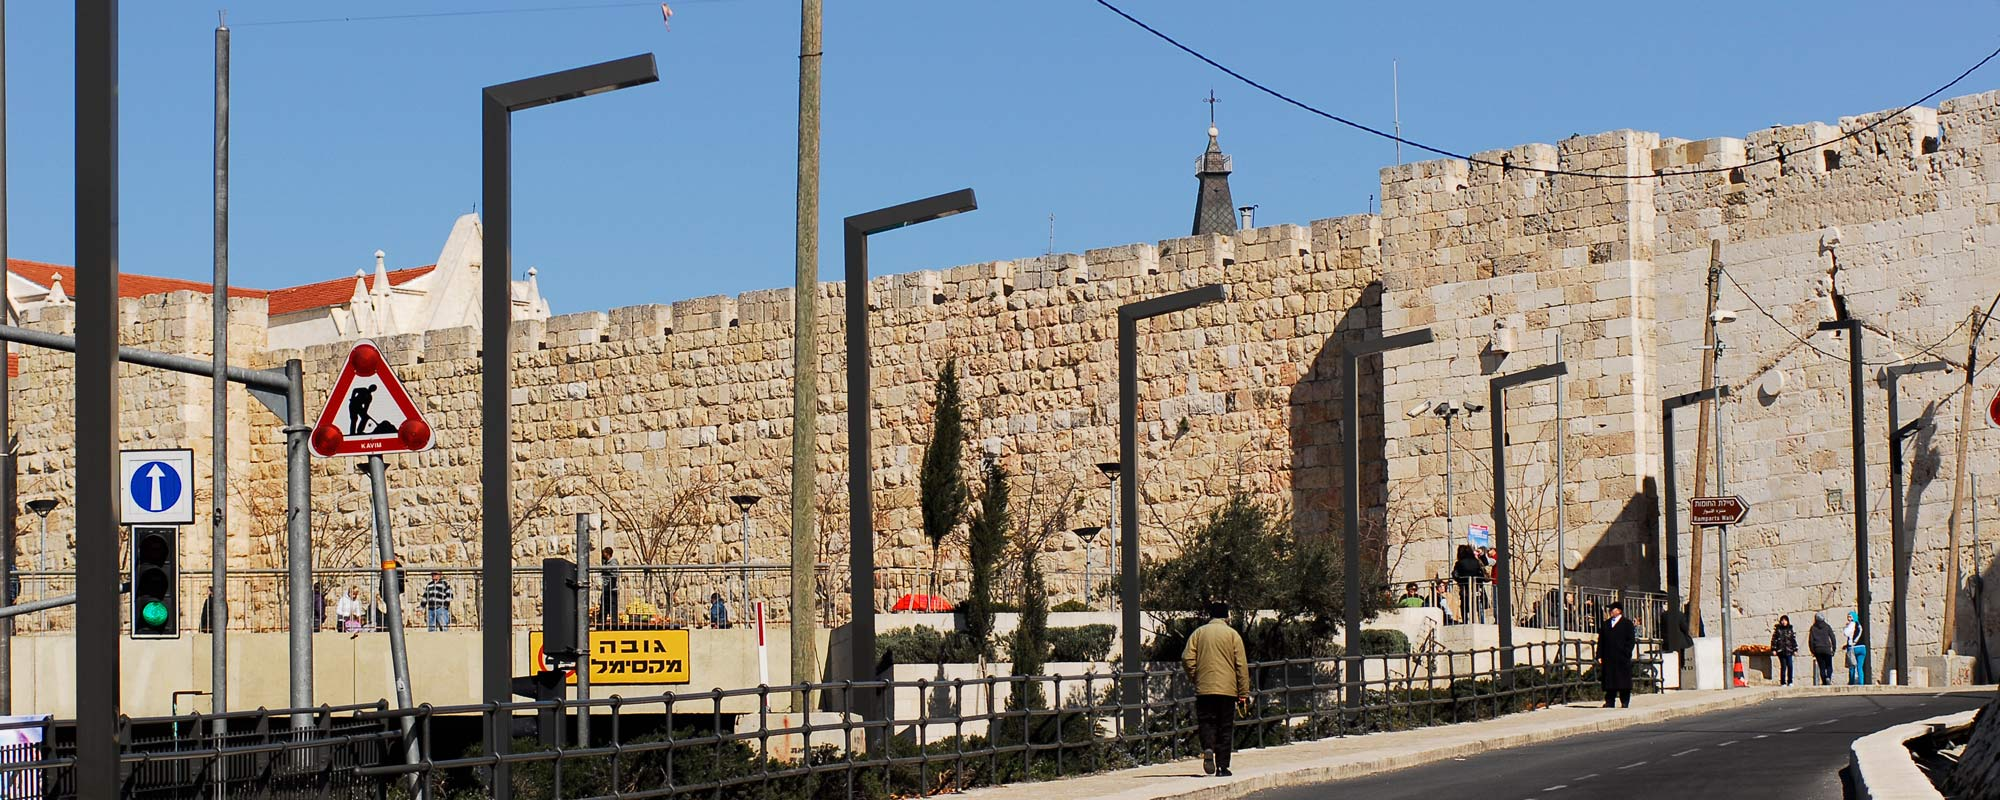 D_Jerusalem_Jaffa-gate_3